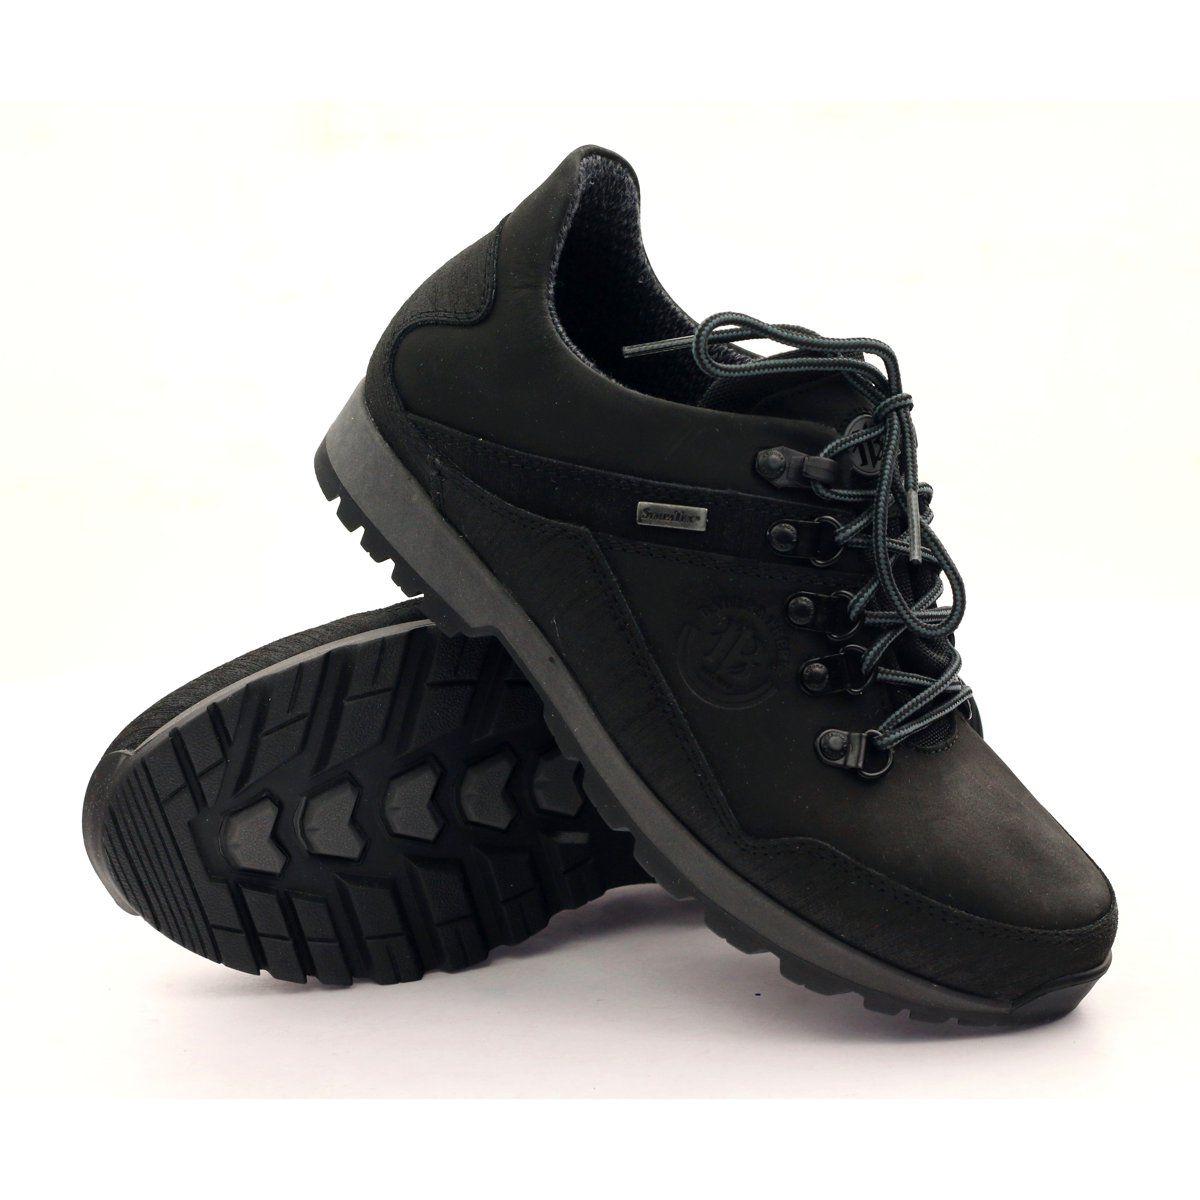 Trekking With Membrane Sympatex Badura 3141 Black Women Shoes Trekking Shoes Hiking Boots